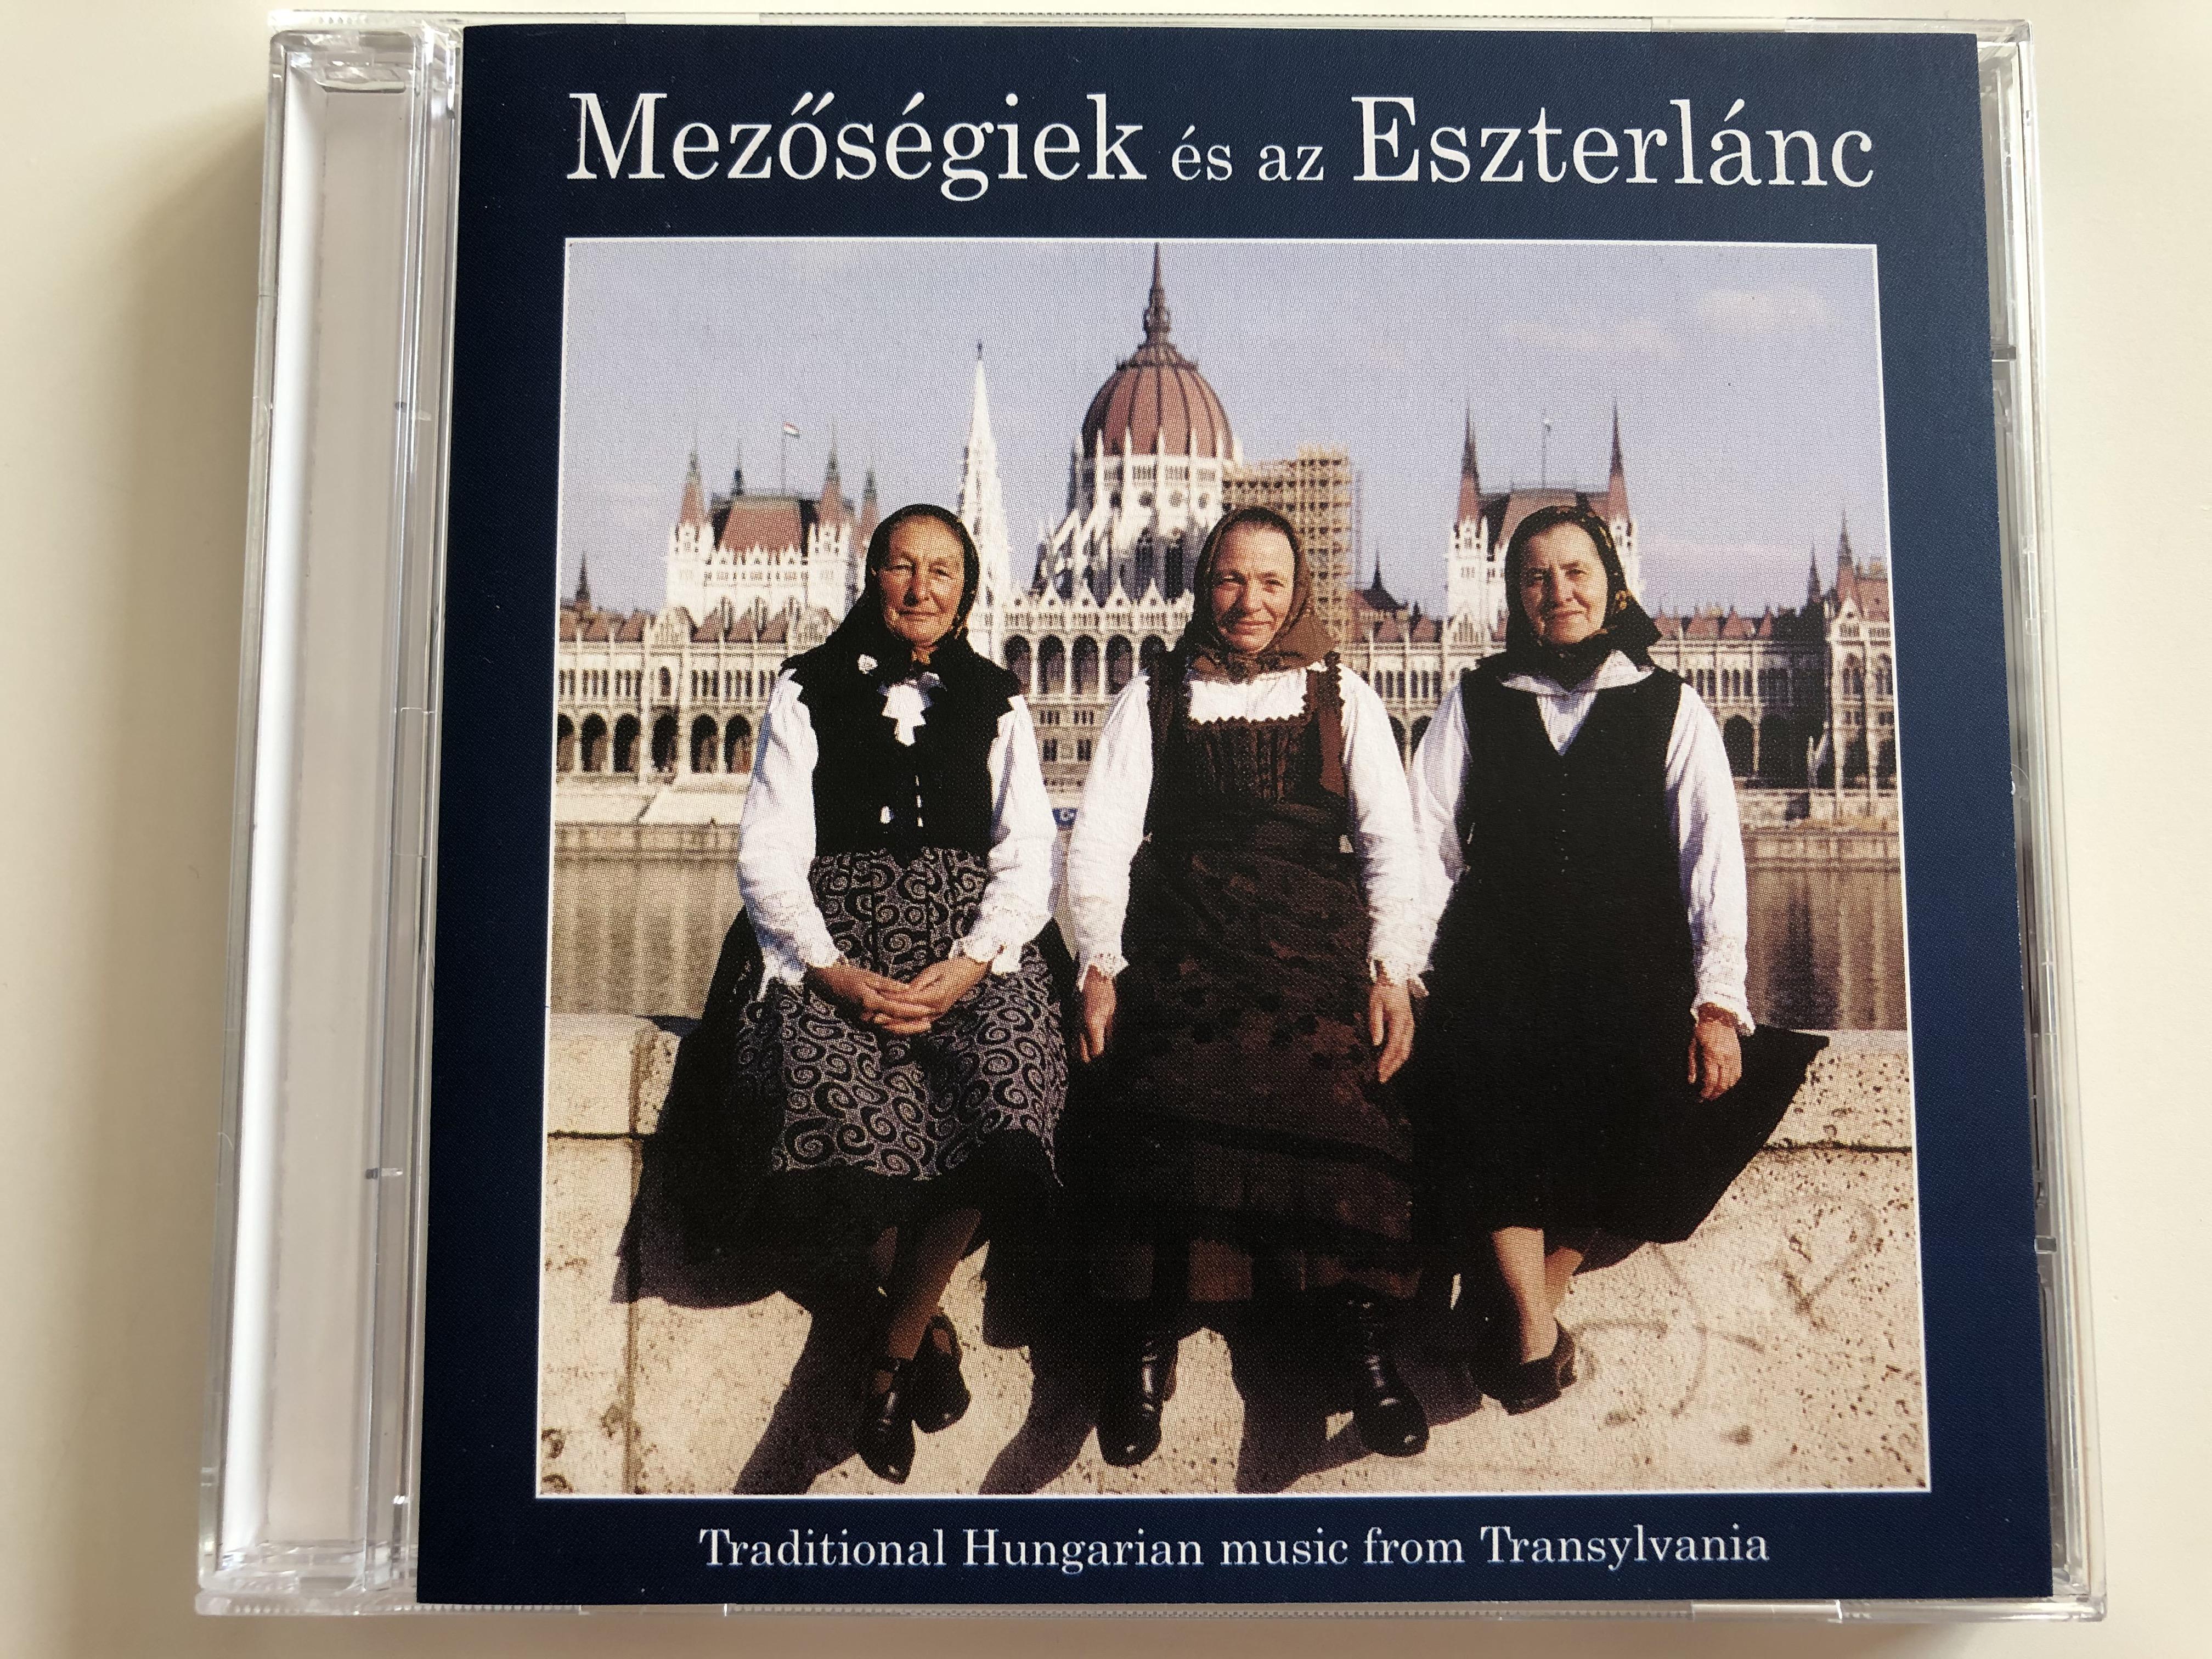 mez-s-giek-s-az-eszterl-nc-traditional-hungarian-music-from-transylvania-fon-records-audio-cd-2001-bal-002-1-.jpg